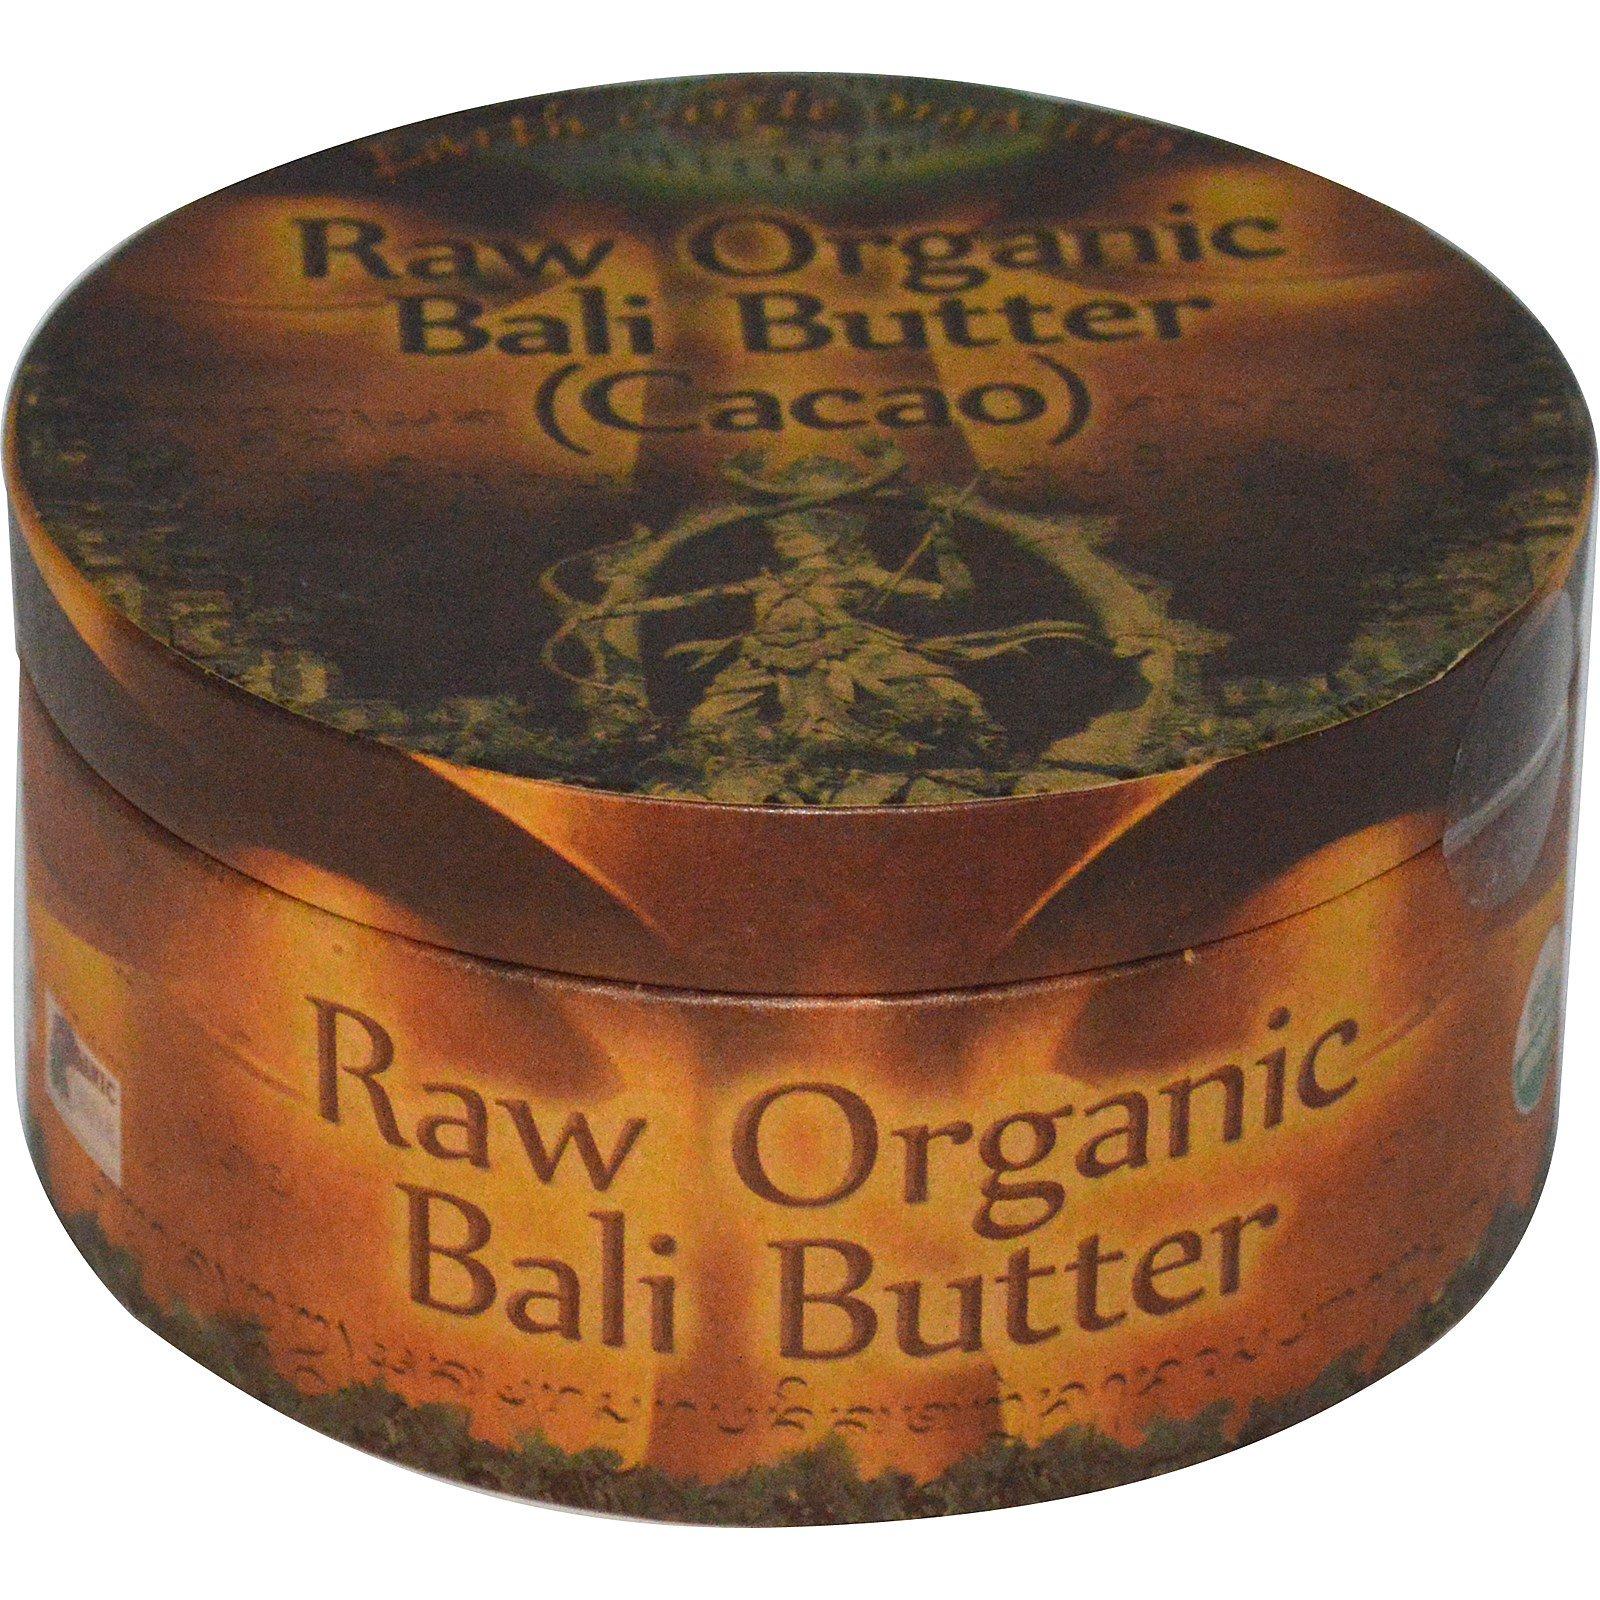 Earth Circle Organics, Raw Organic Bali Butter (Cacao), 250 g ...